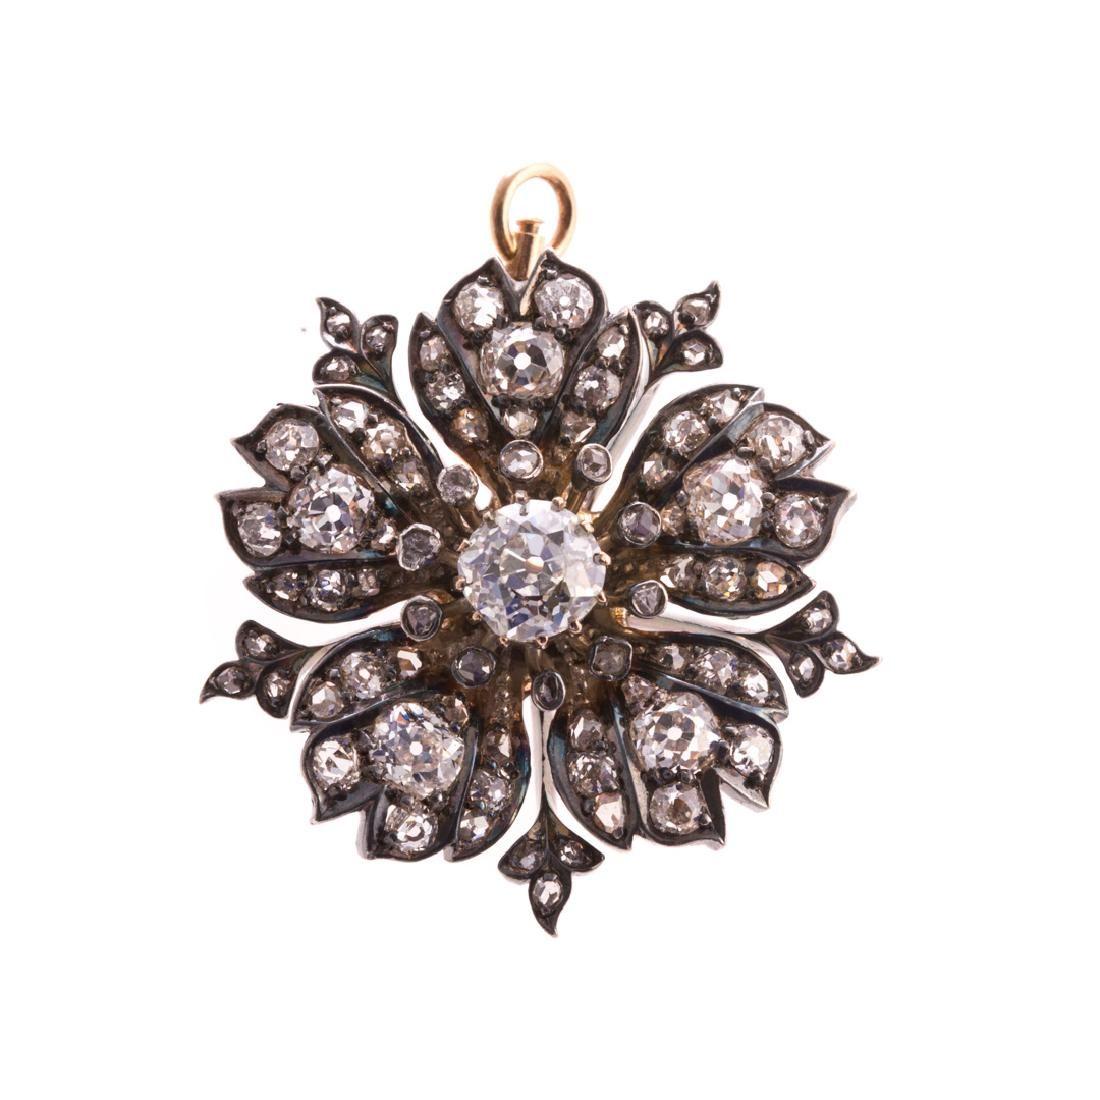 A Victorian Diamond Starburst Pin/Pendant in 14K